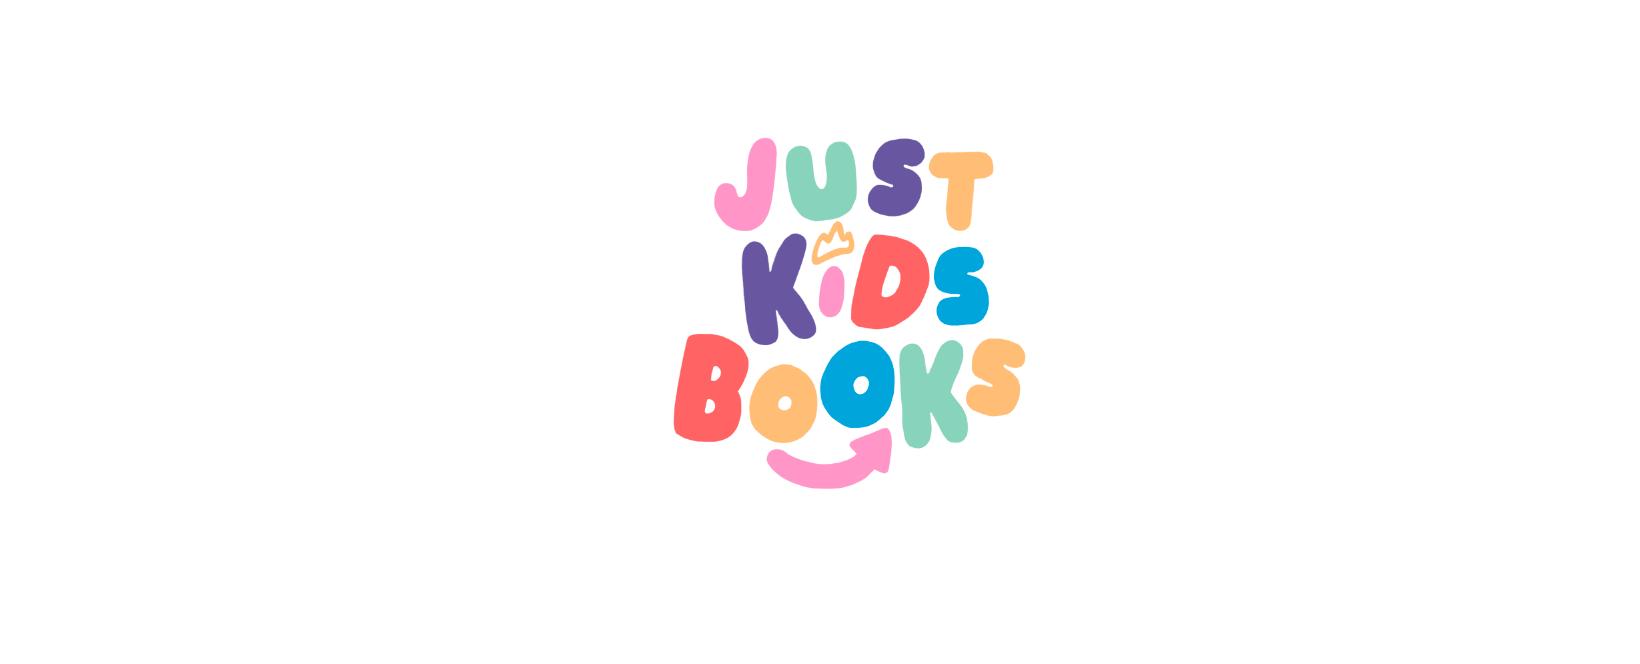 Just Kids Books Discount Code 2021